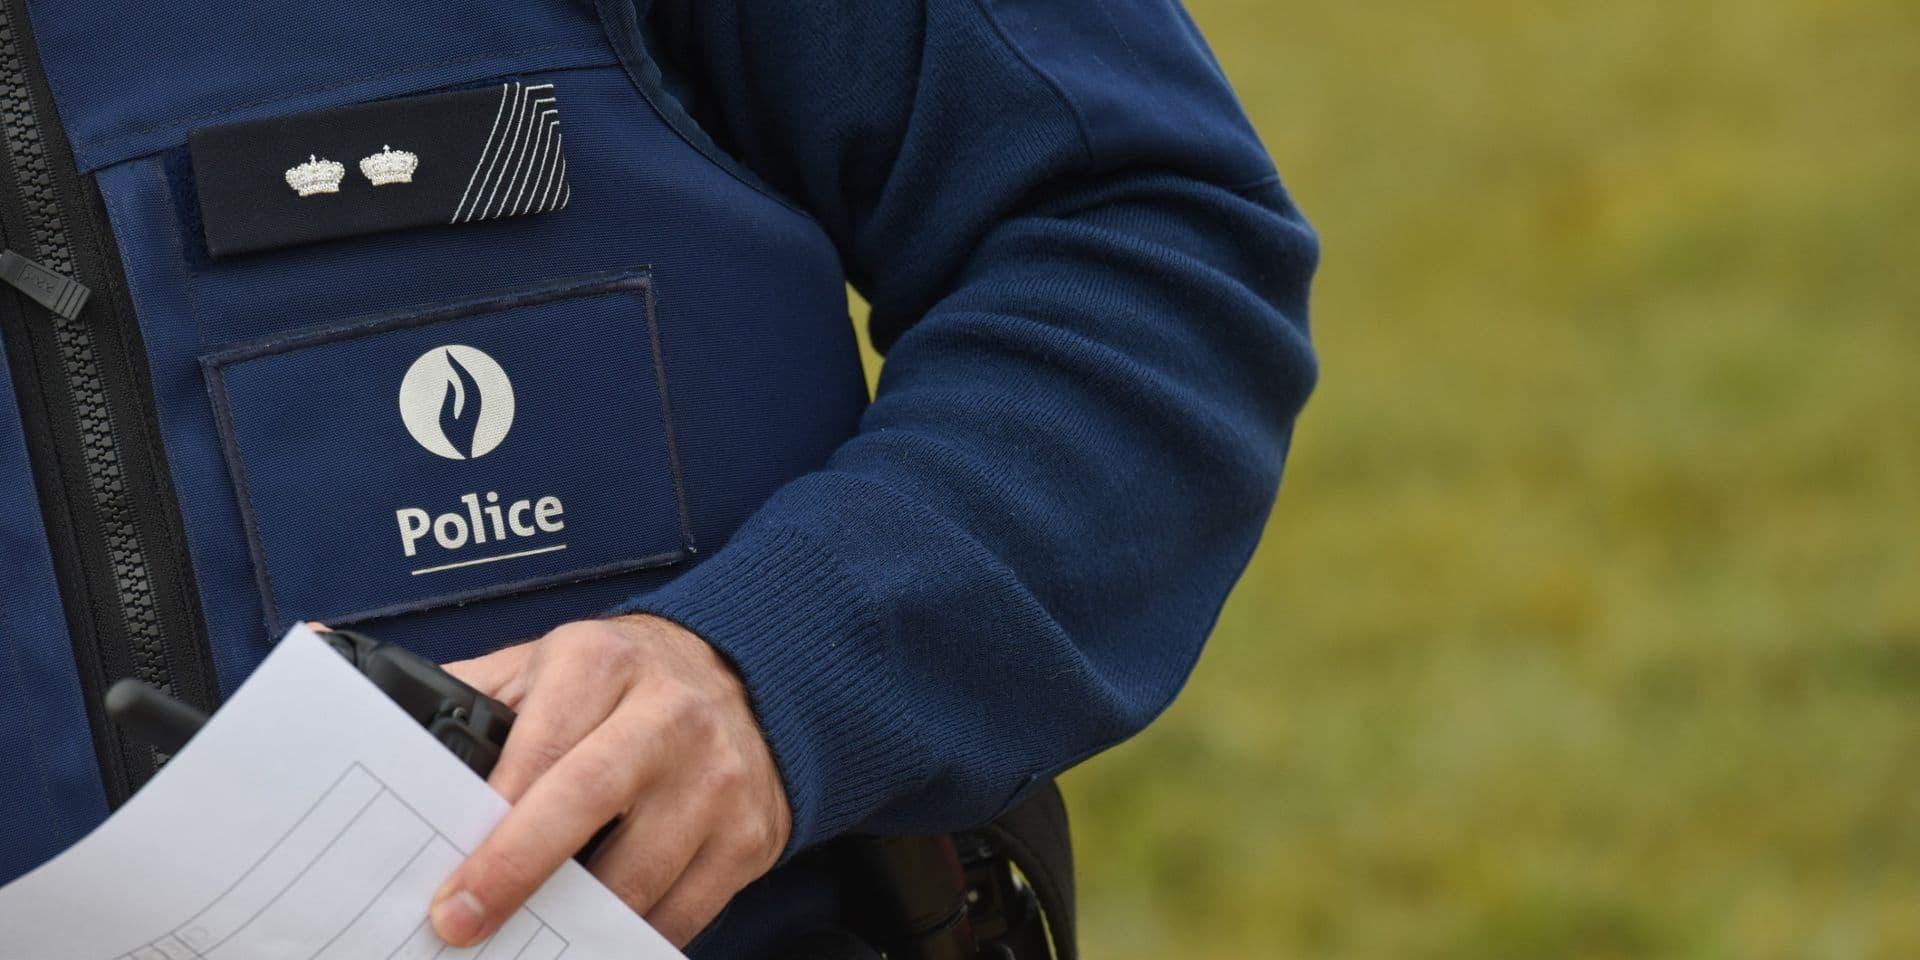 Covid-19 : la police verbalise les conducteurs circulant sans motifs valables